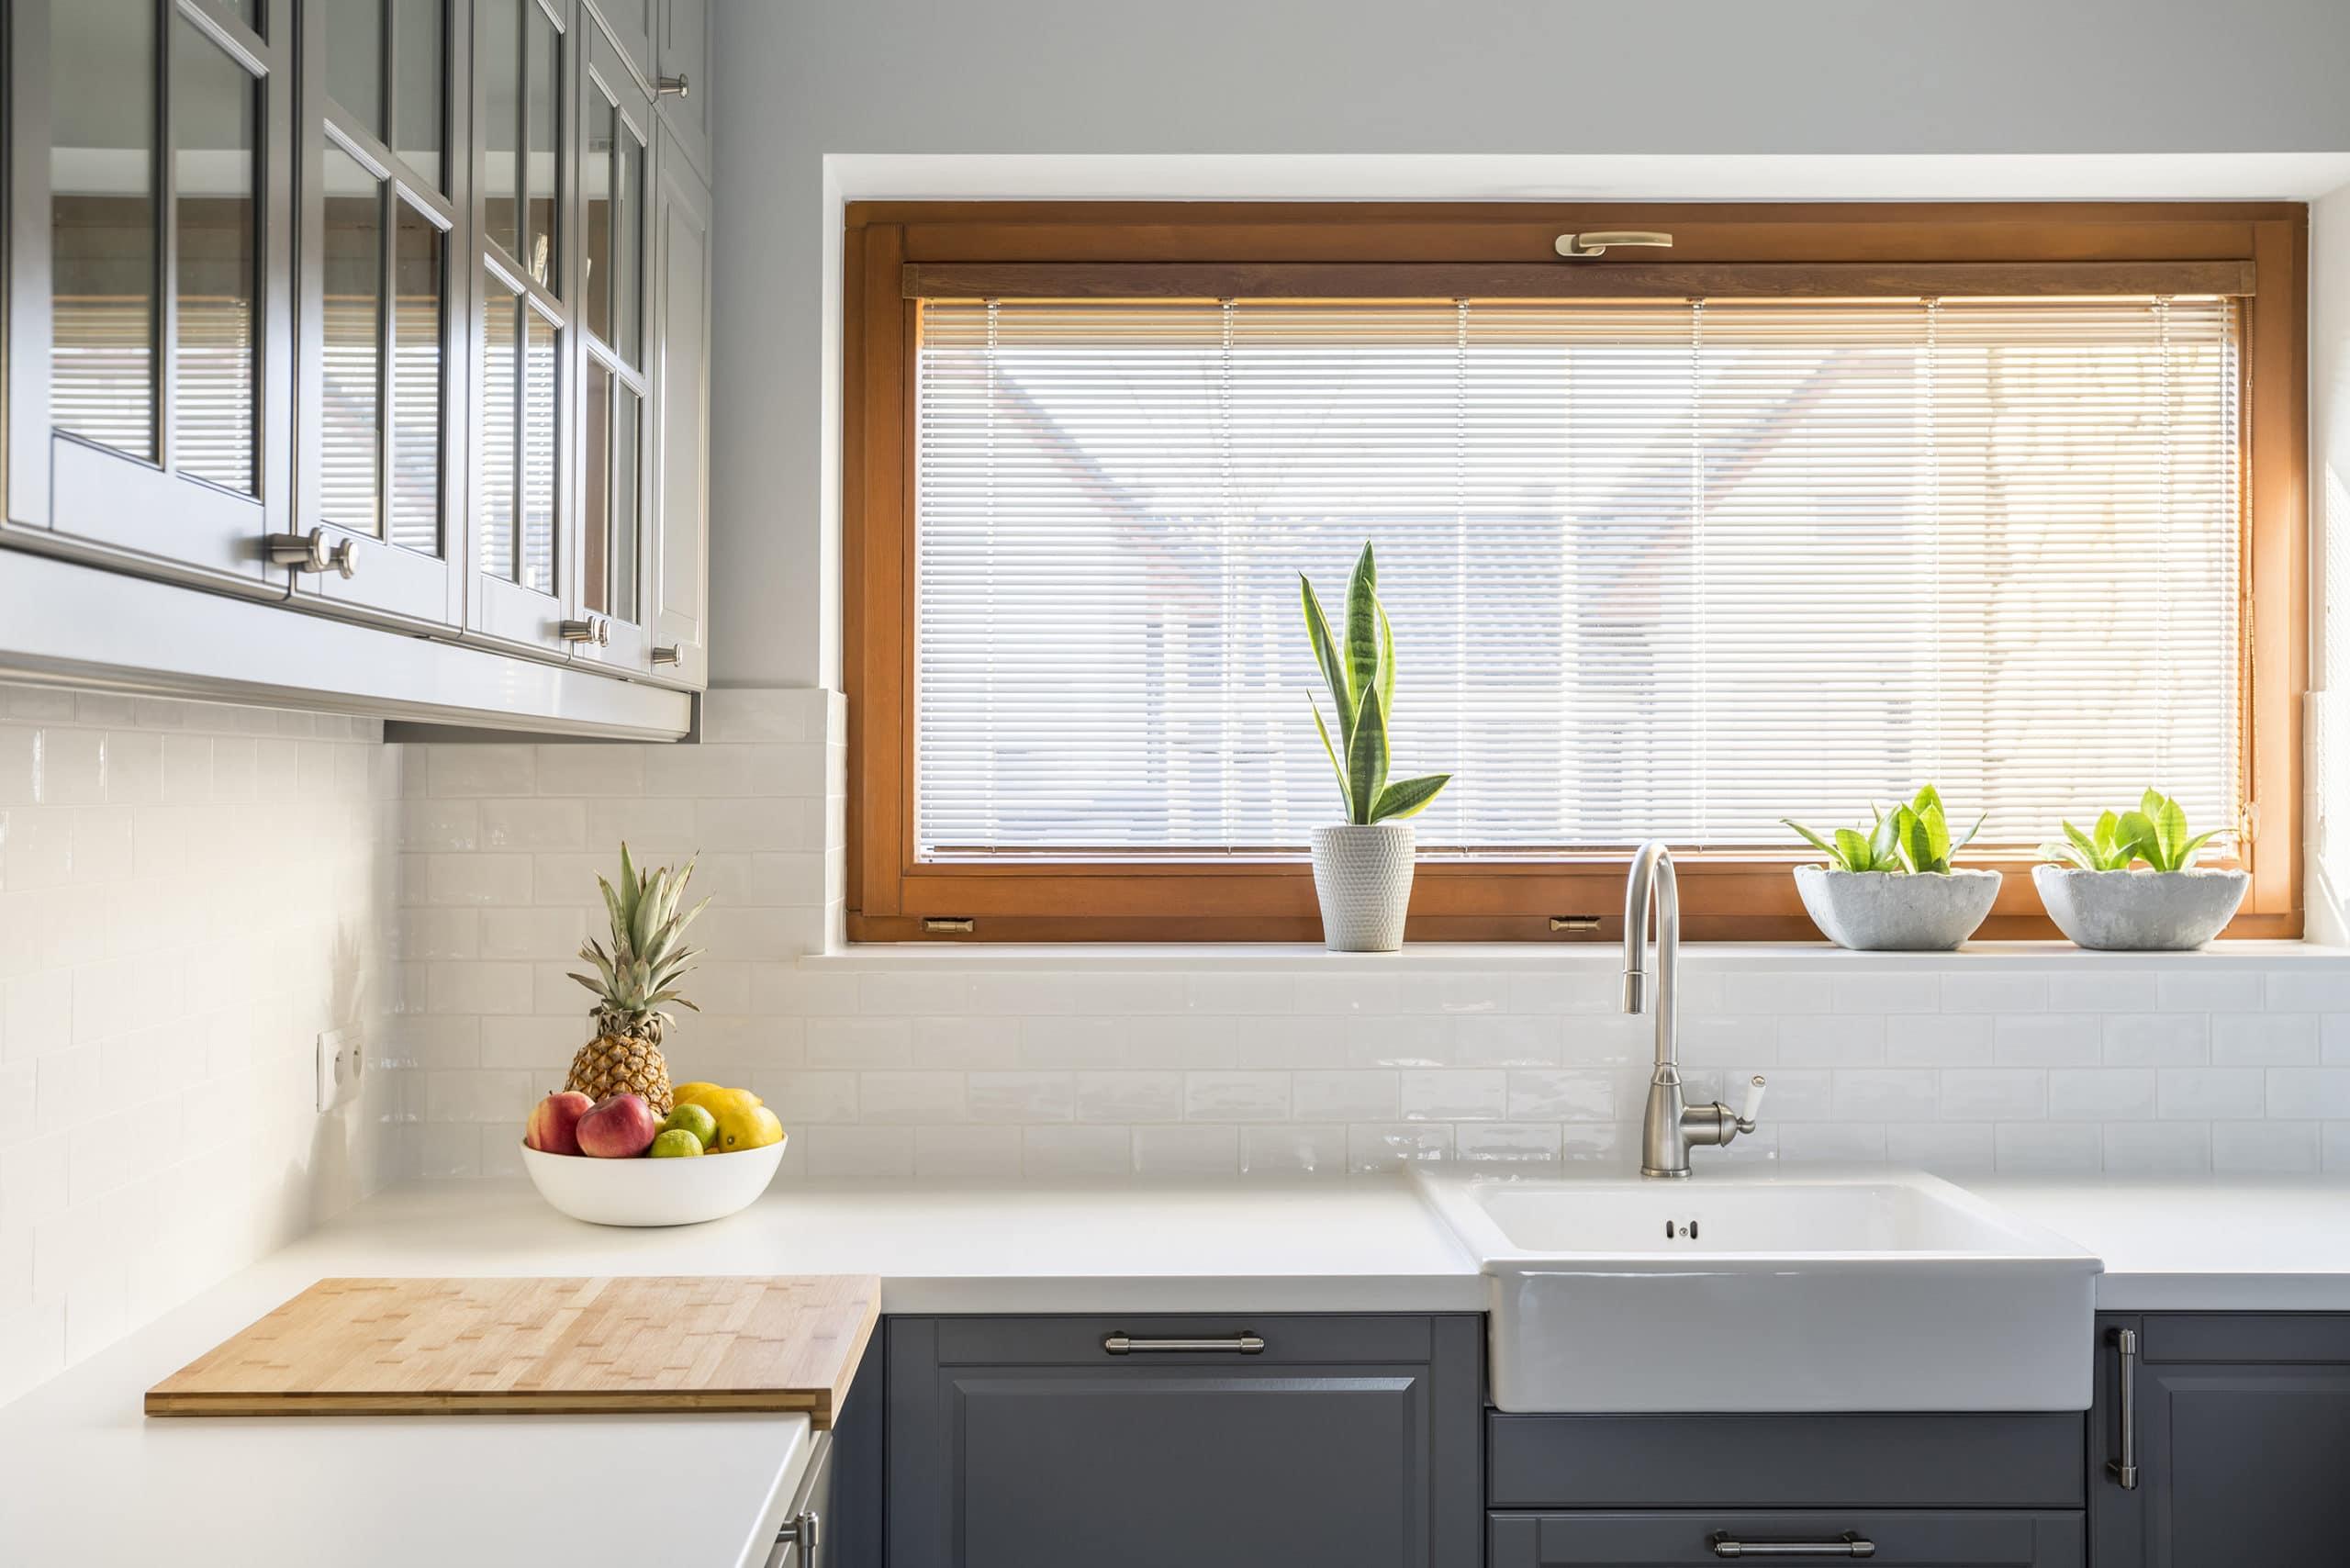 kitchen craftsmen kitchen designer stavros kitchen renovation white counters